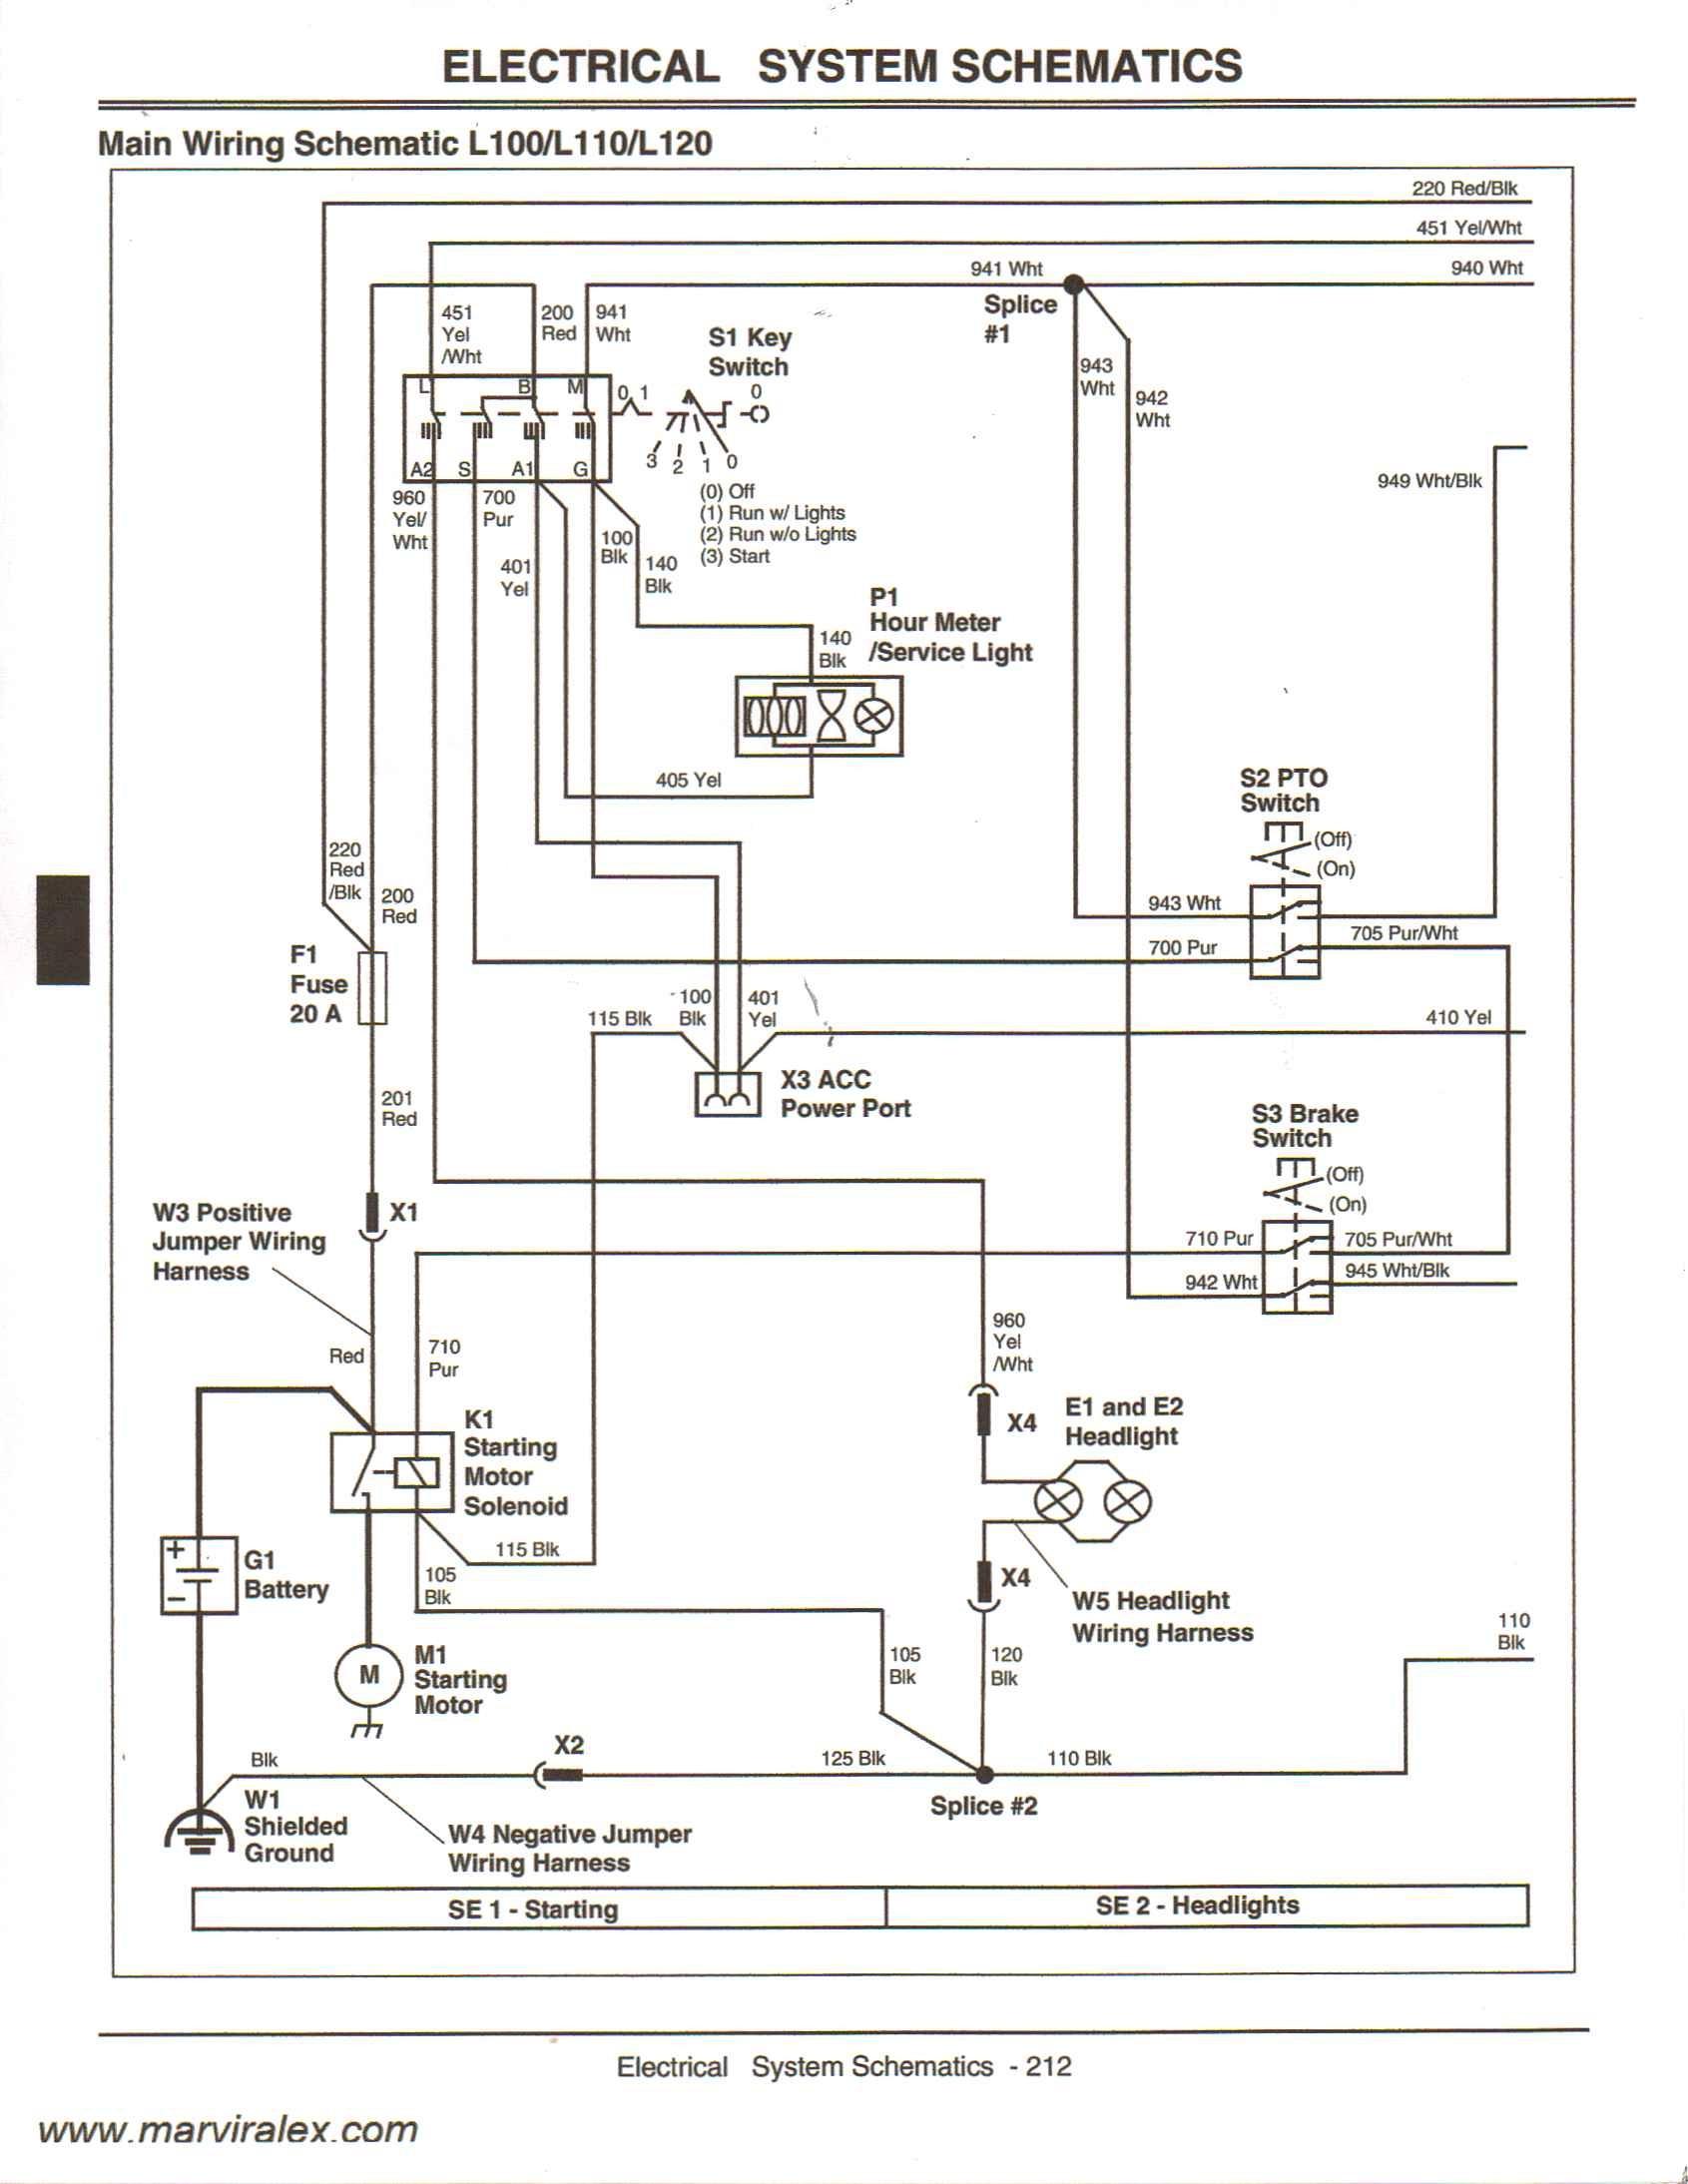 john deere lt155 wiring schematic free wiring diagram. Black Bedroom Furniture Sets. Home Design Ideas